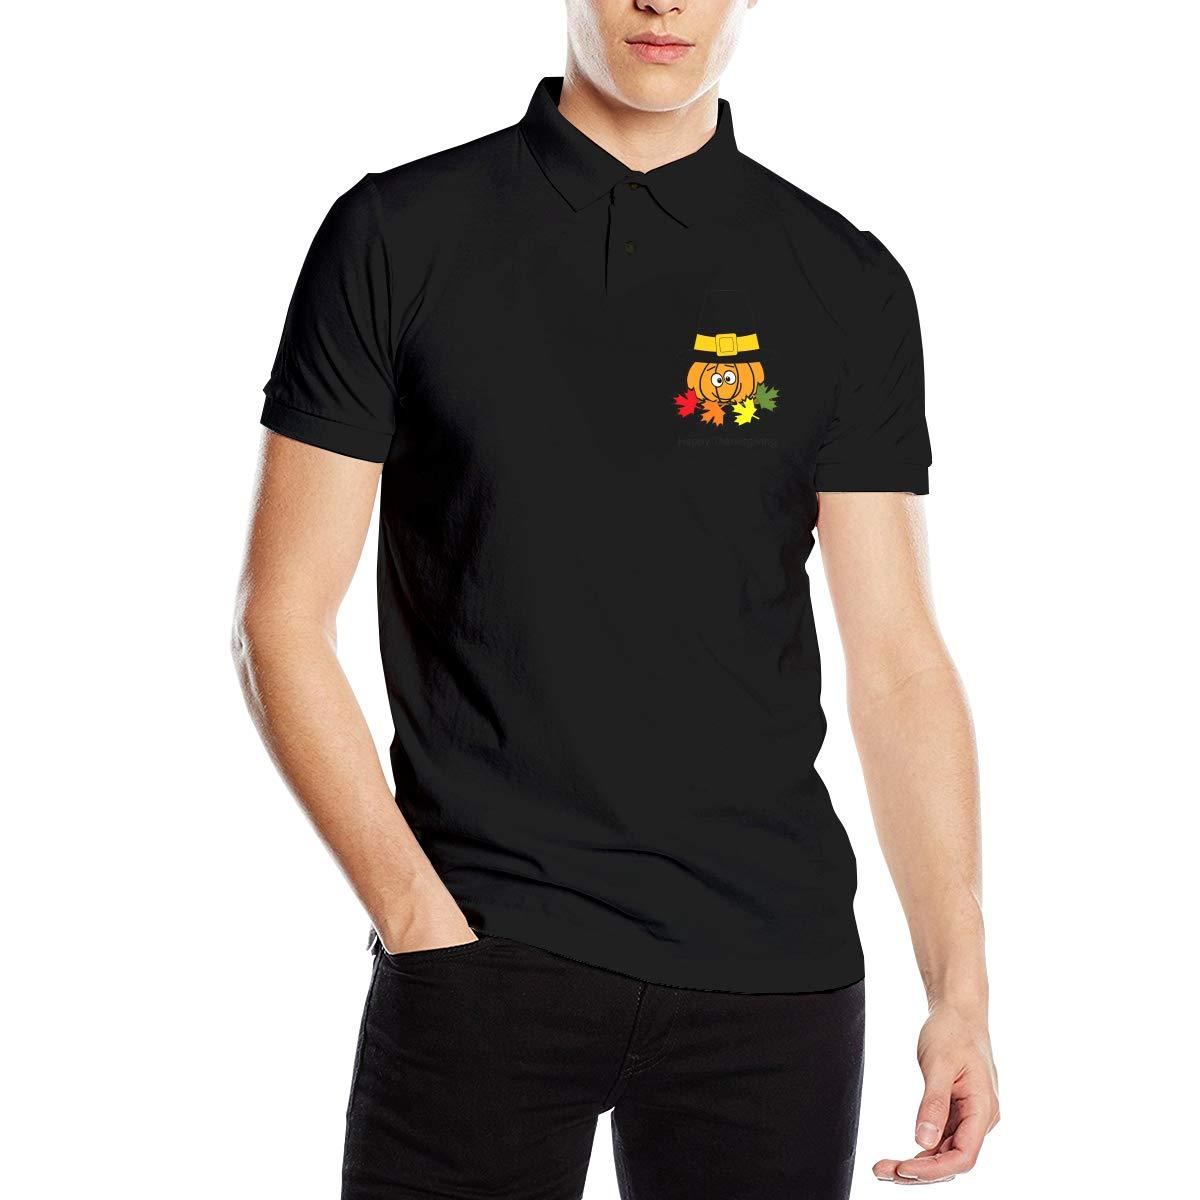 Hengteng Men Designed Breathable Pilgrim Pumpkin Jack-o-Lantern Short Sleeve Classic Polo Shirts Black